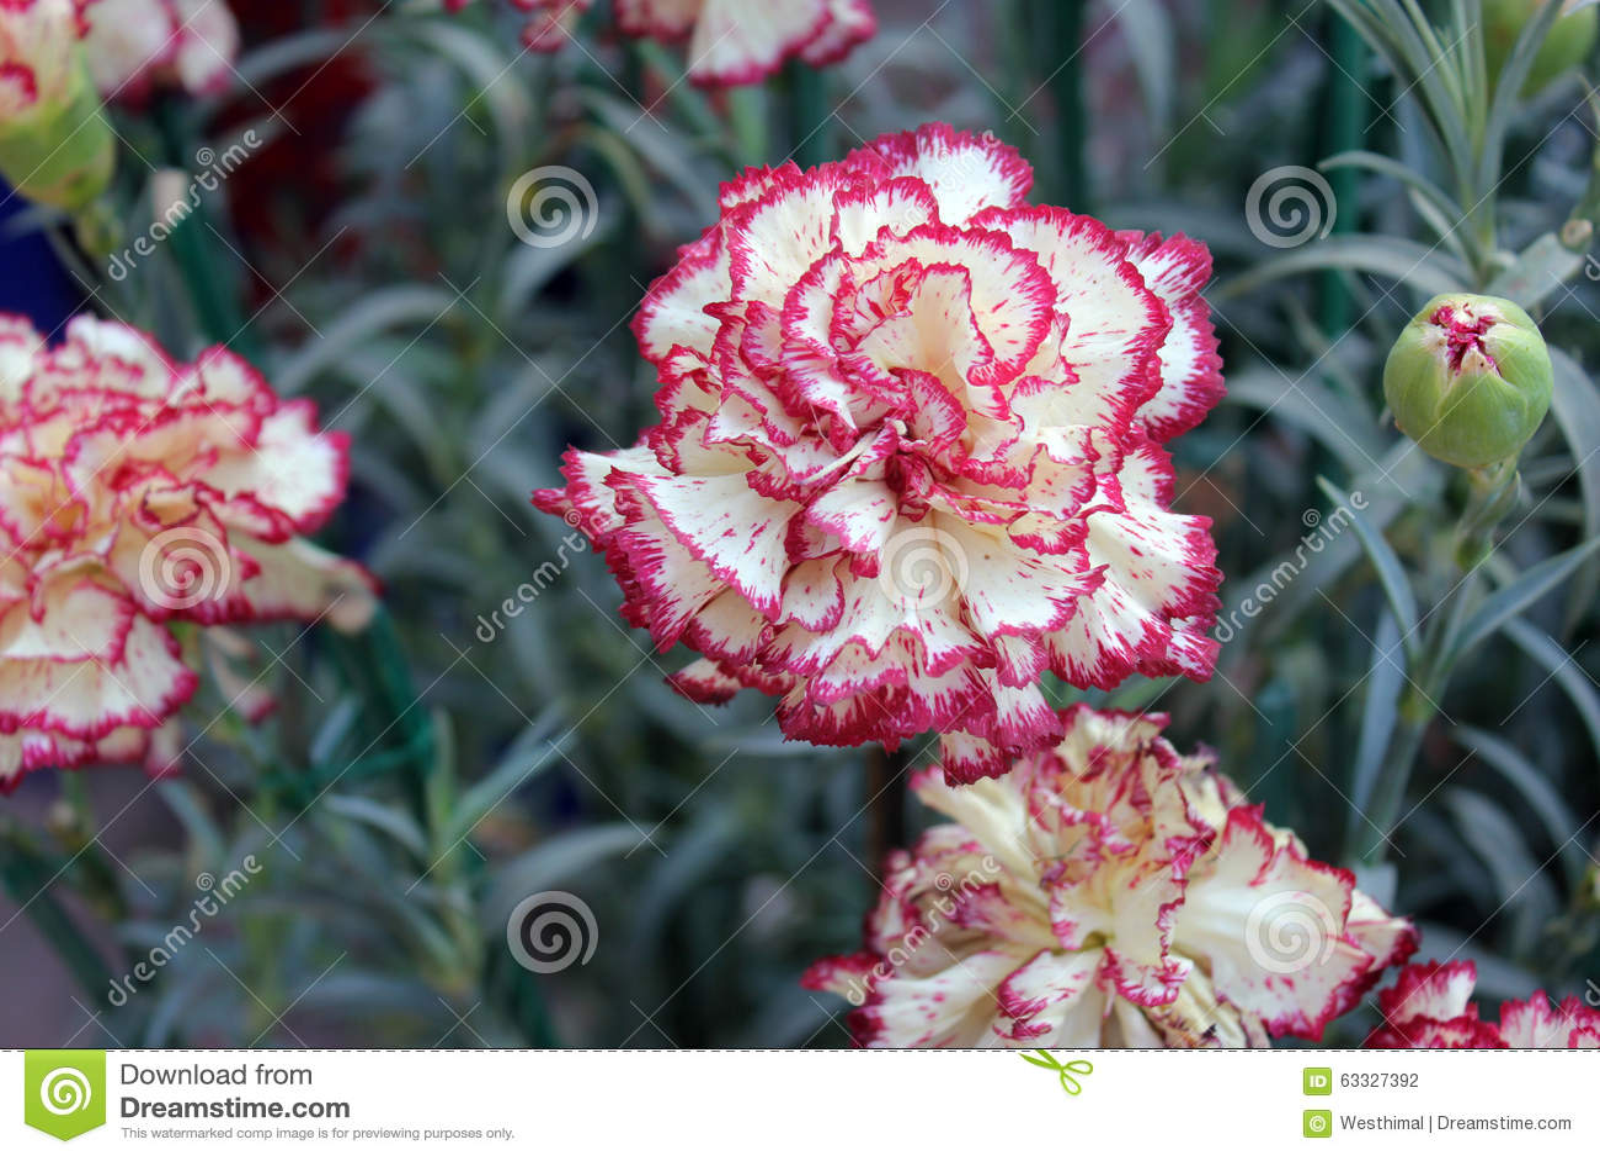 dianthus caryophyllus raspberry ripple stock photo image 63327392. Black Bedroom Furniture Sets. Home Design Ideas